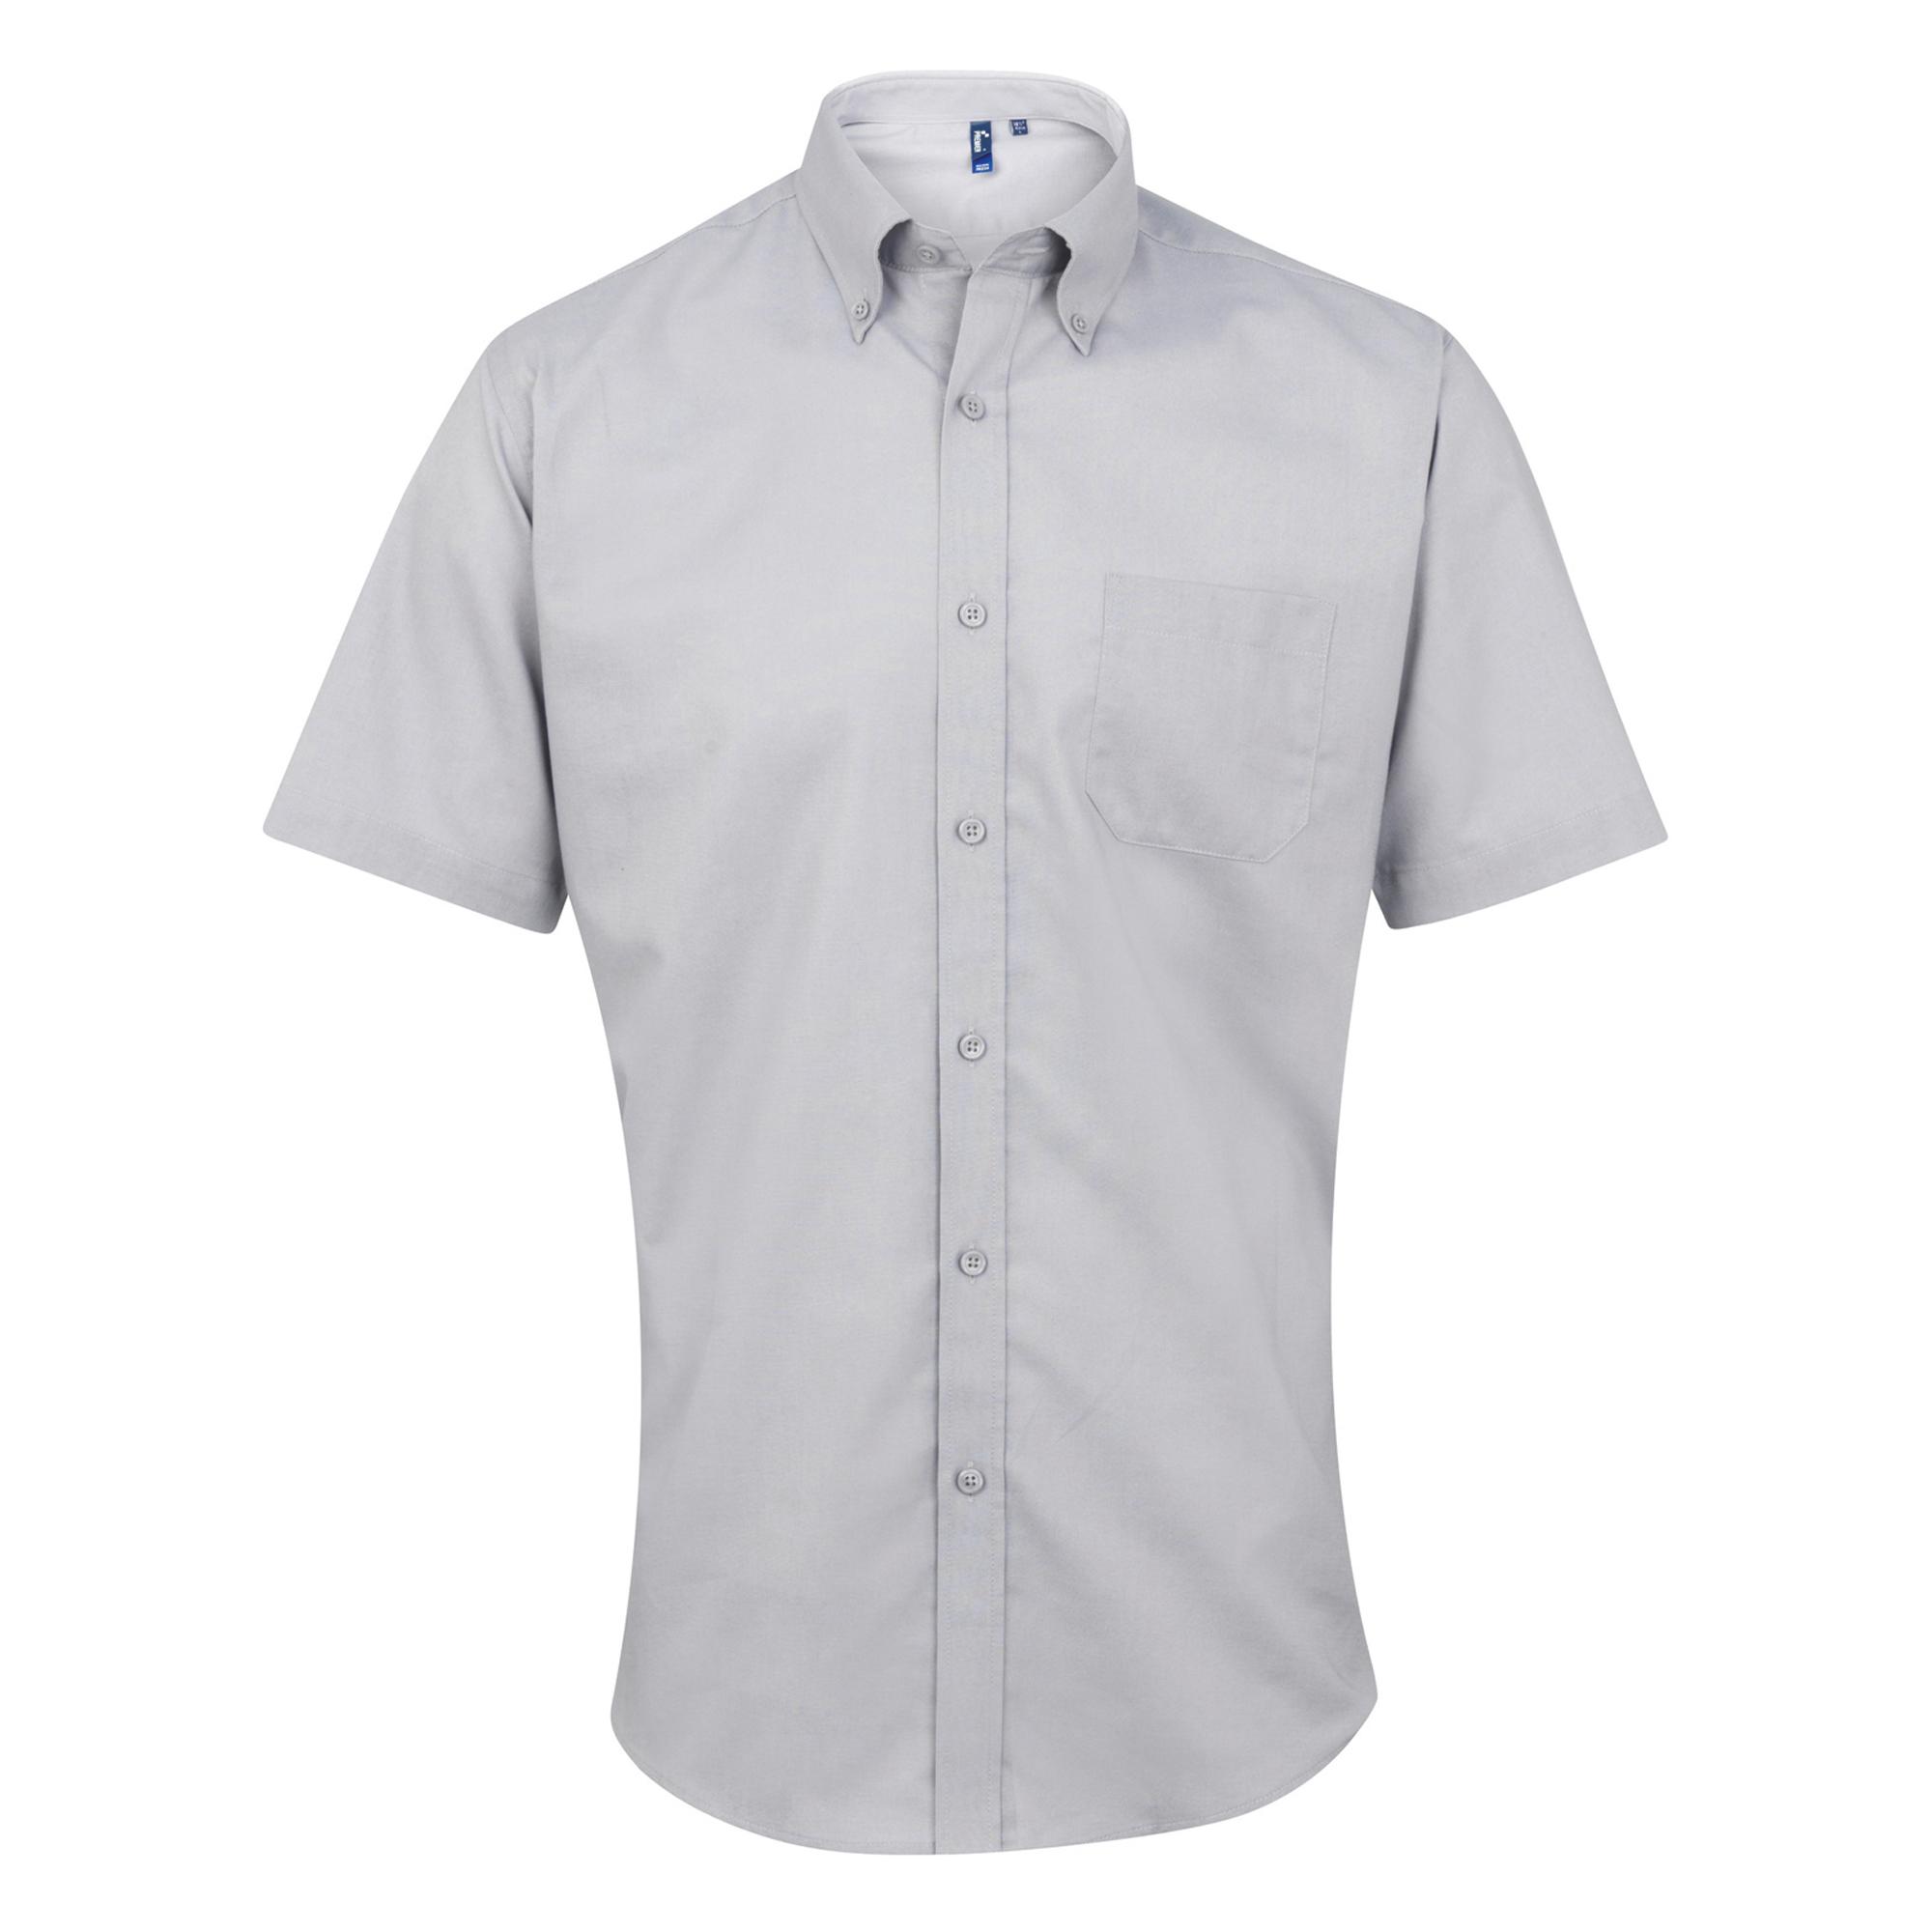 Premier Mens Signature Oxford Short Sleeve Work Shirt (15) (Silver)